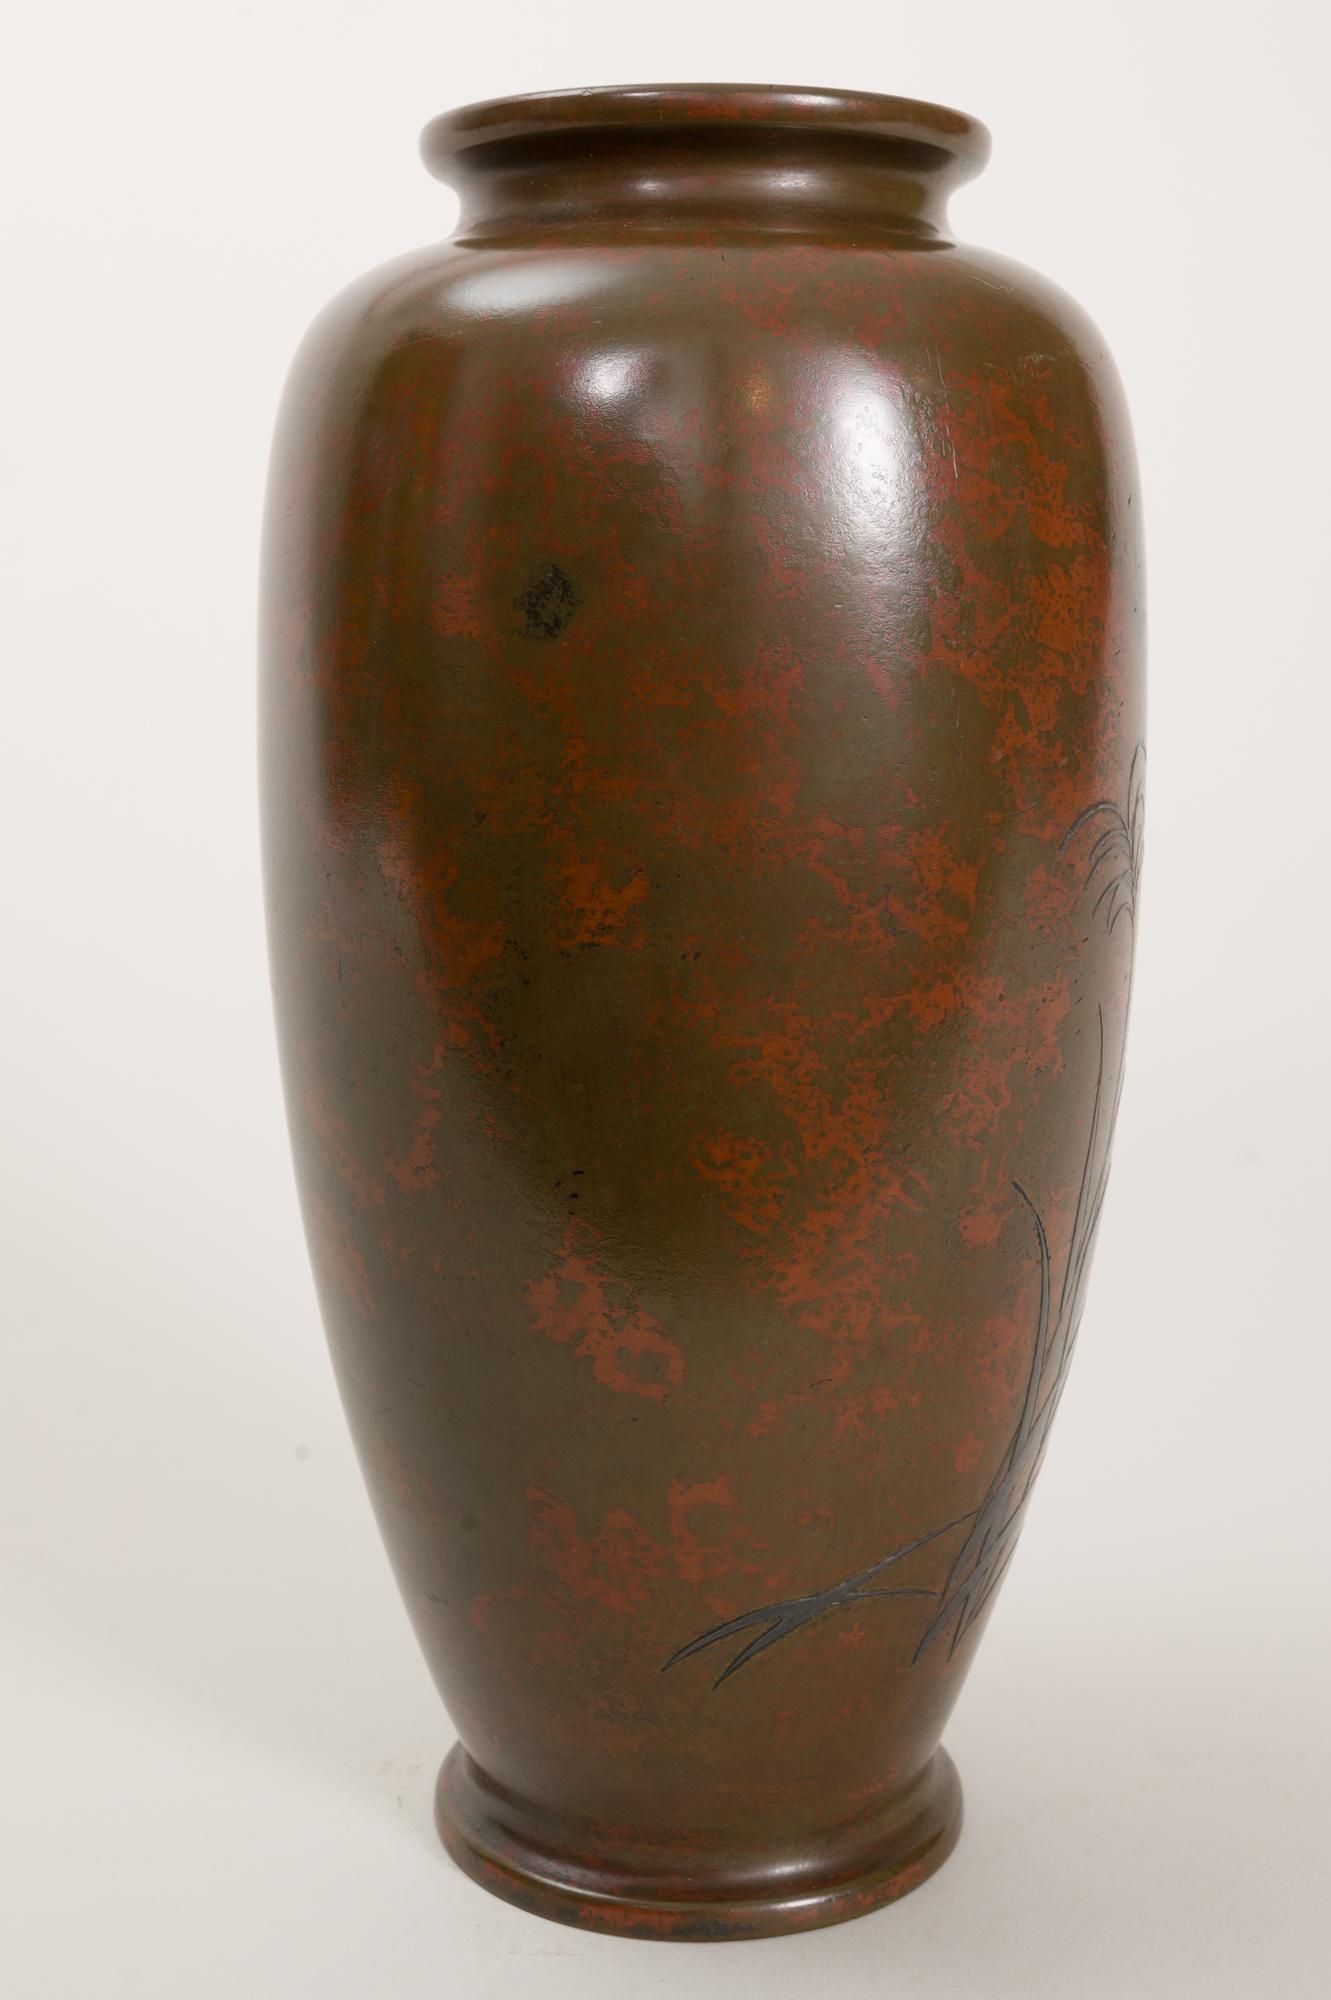 Japanese bronze vase, Japanese bronze, Japanese vase, antique bronze vase, antique vase,